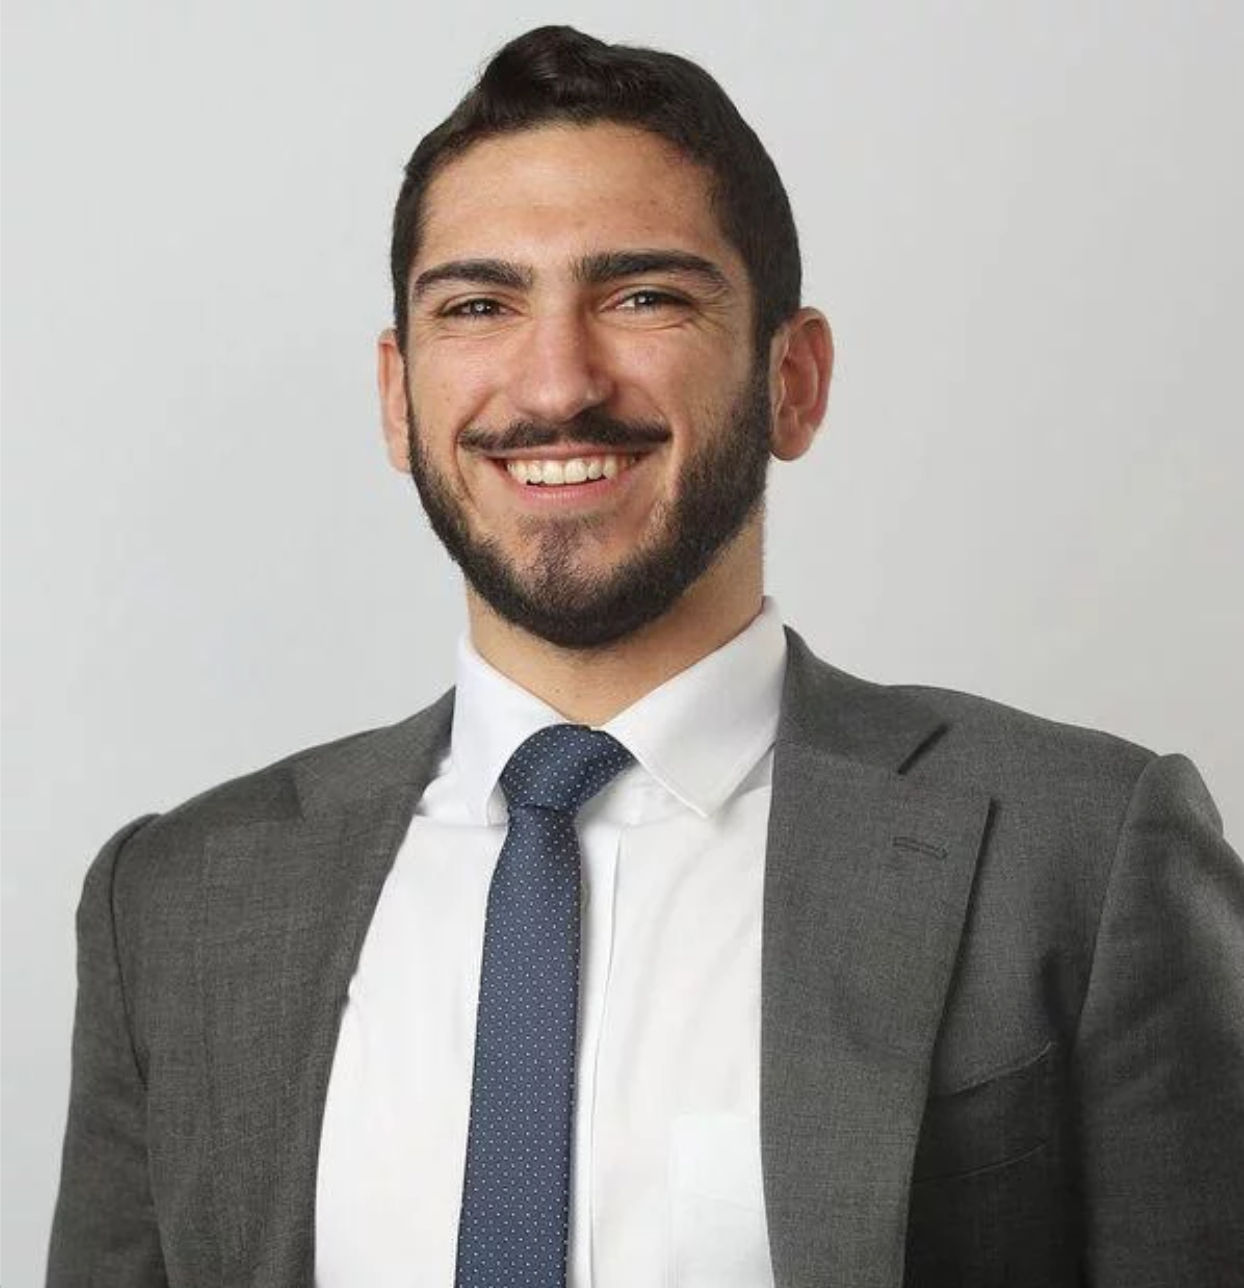 Eric Firouzbakht